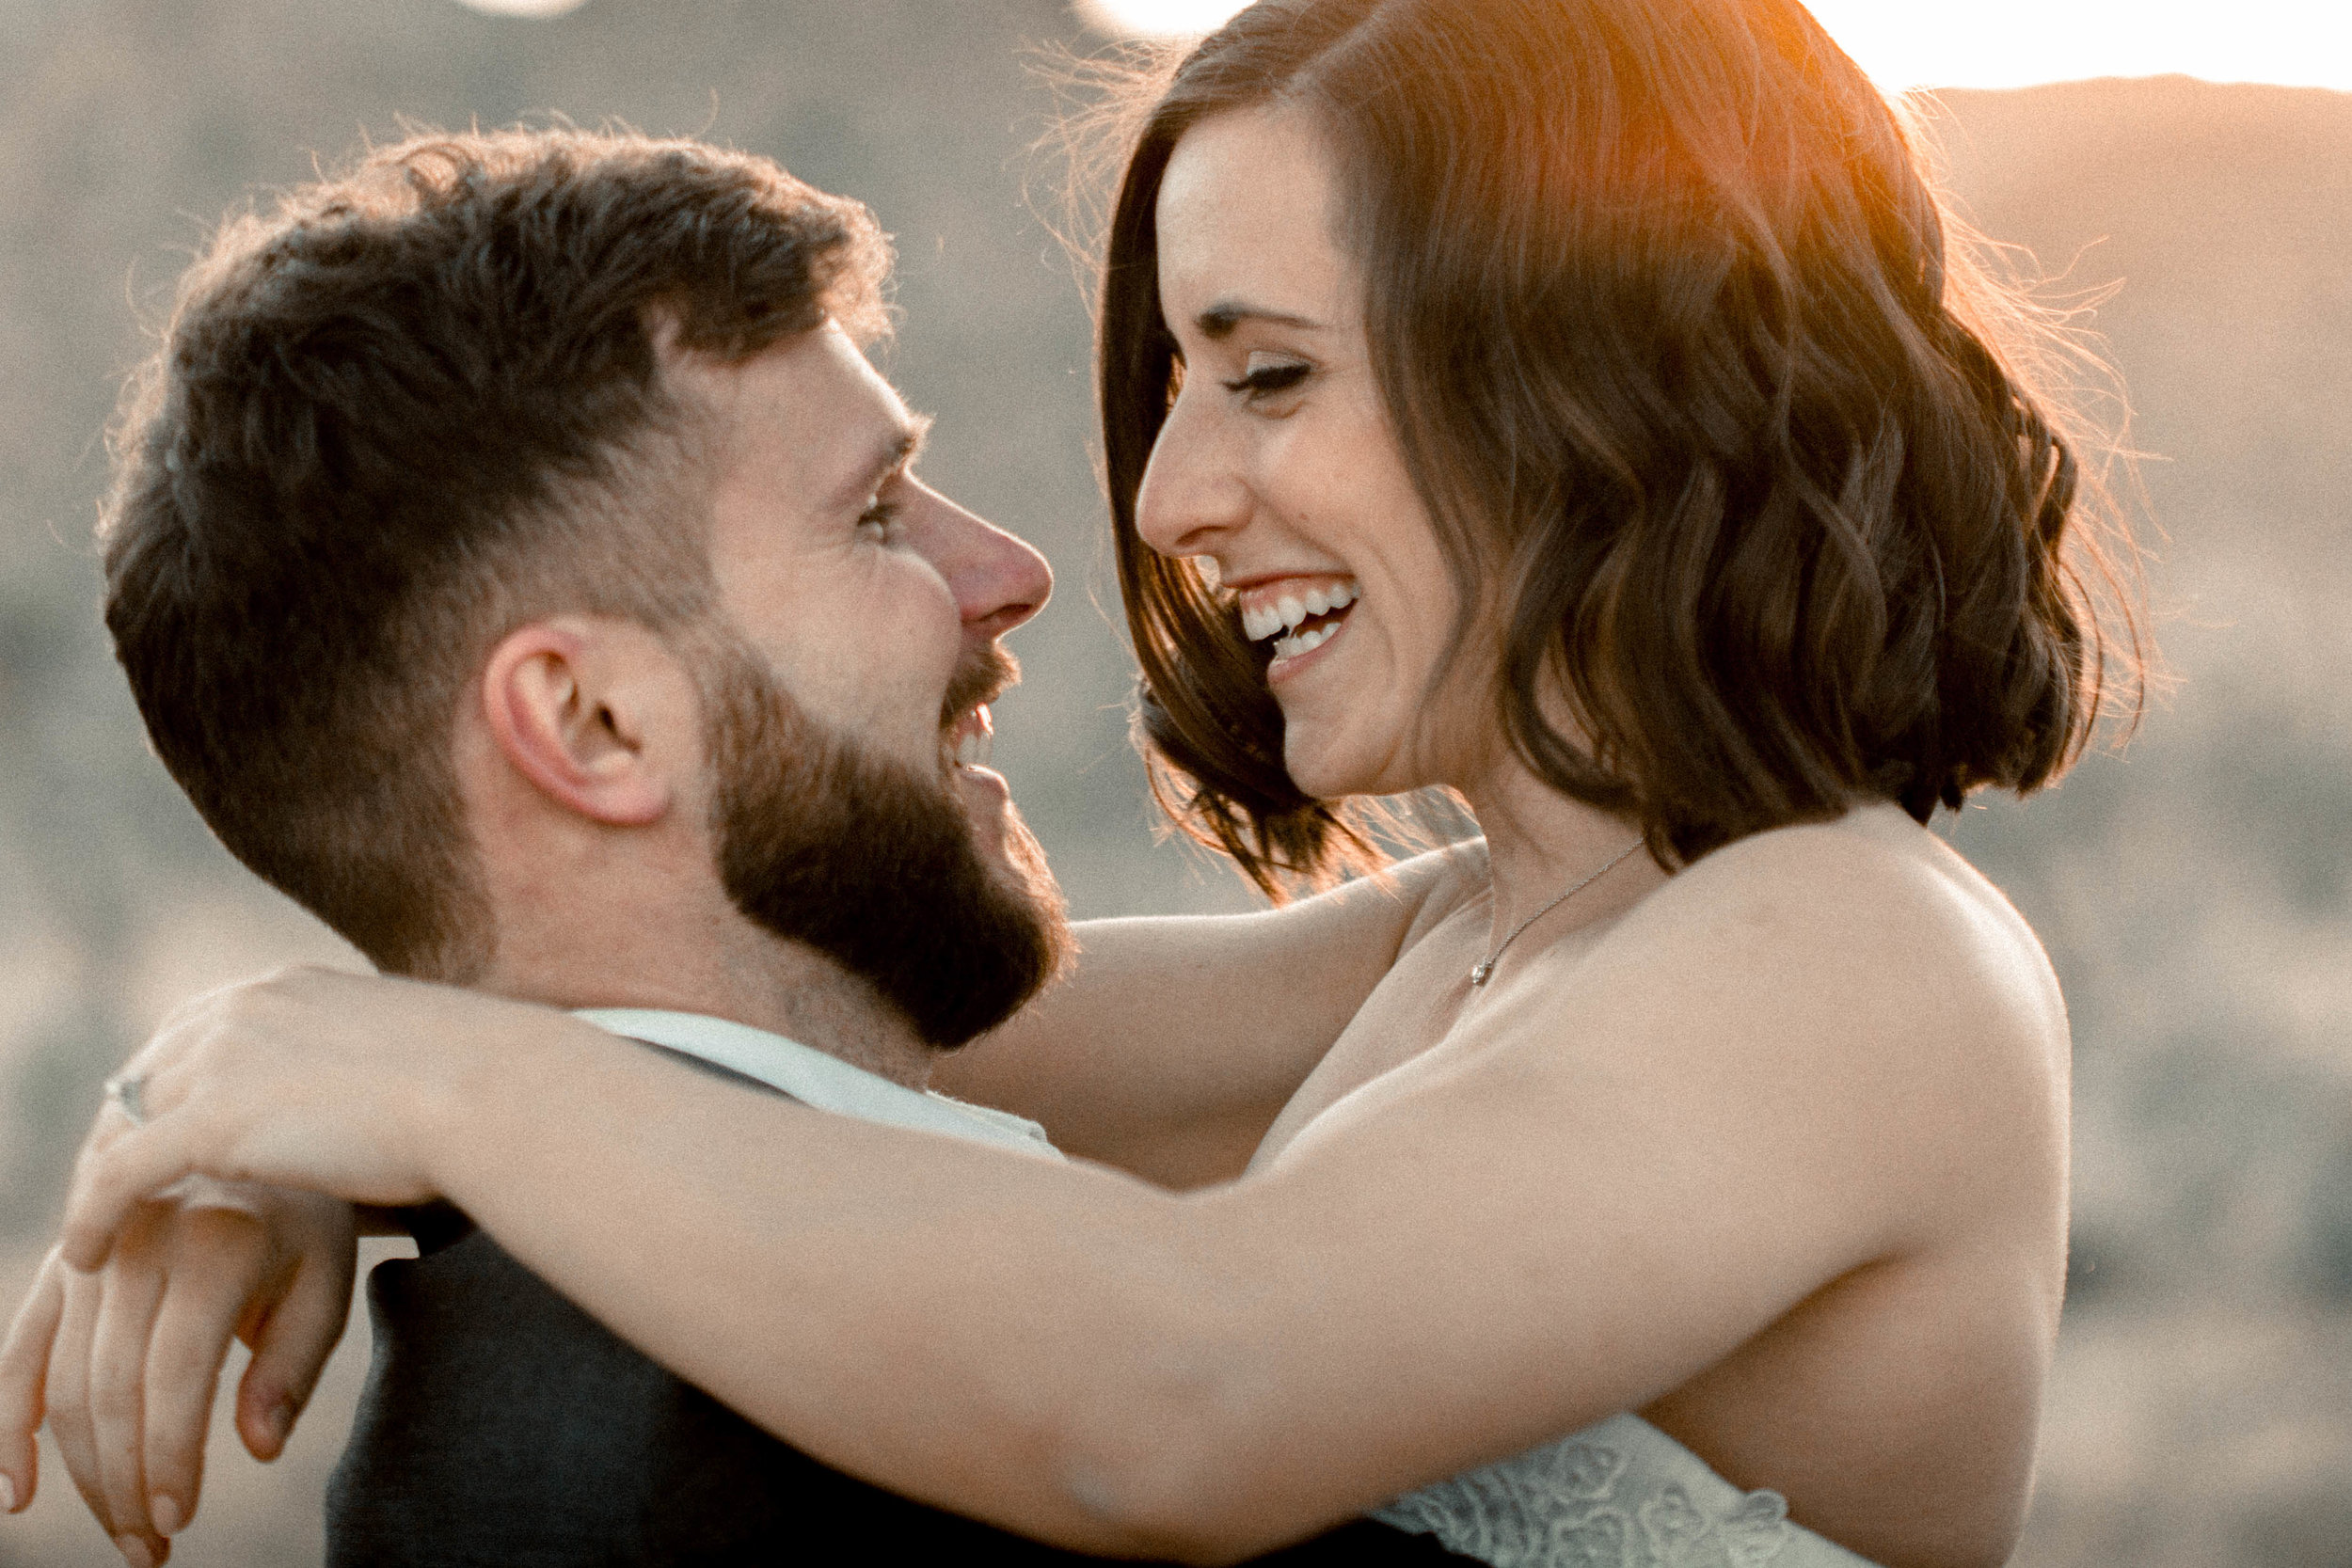 nicole-daacke-photography-joshua-tree-adventurous-elopement-wedding-national-park-wedding-photographer-adventure-wedding-adventurous-elopement-jtree-joshua-tree-national-park-wedding-photographer-intimate-weddings-golden-desert-love-32.jpg